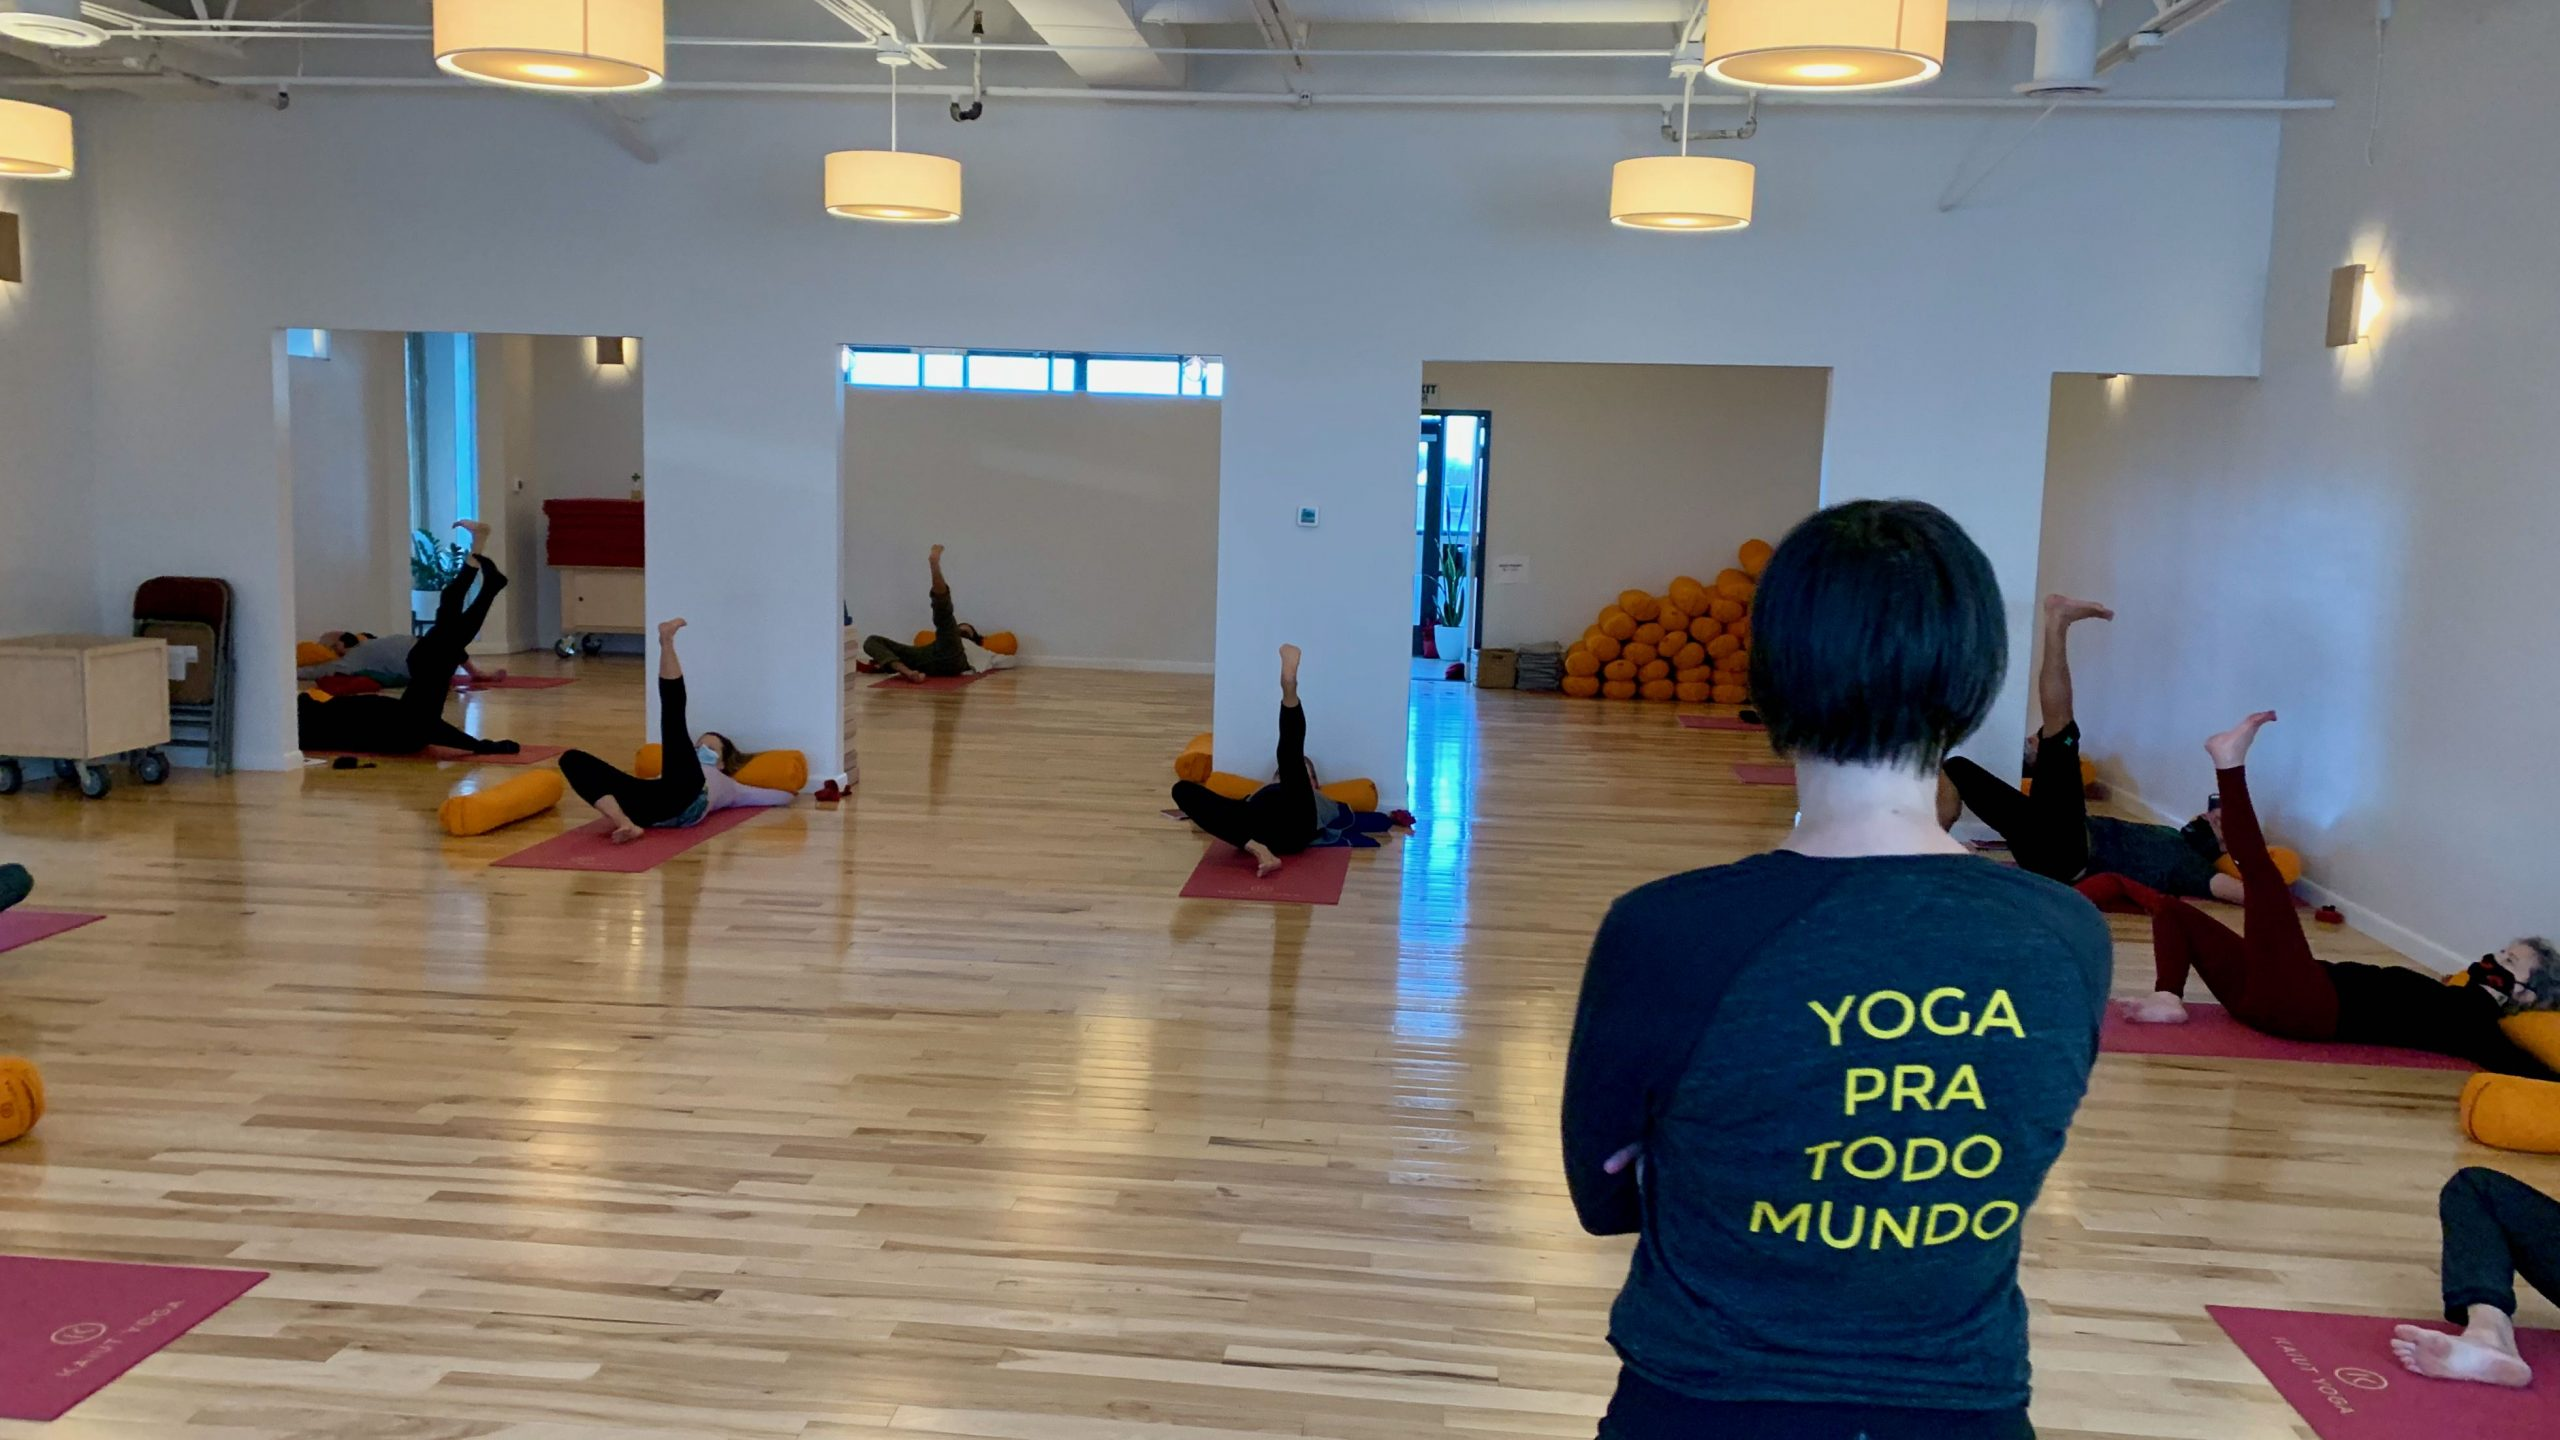 Kaiut Yoga Class Room scaled - Positive Stress